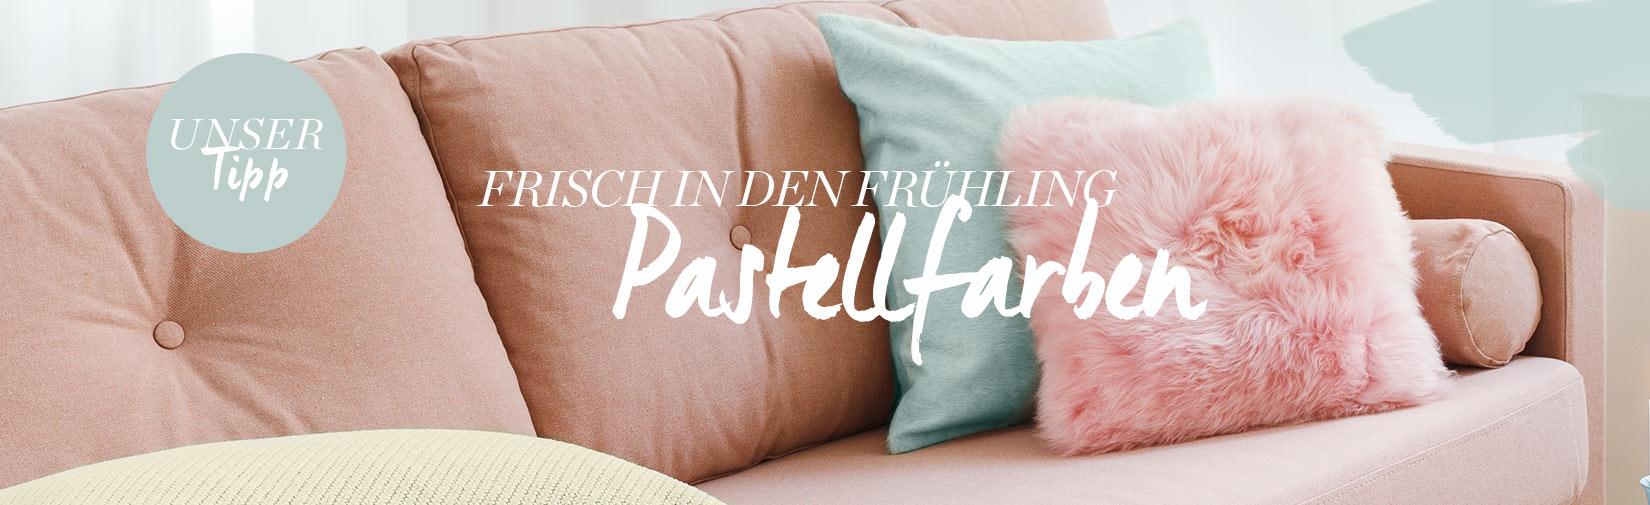 Landingpage pastell